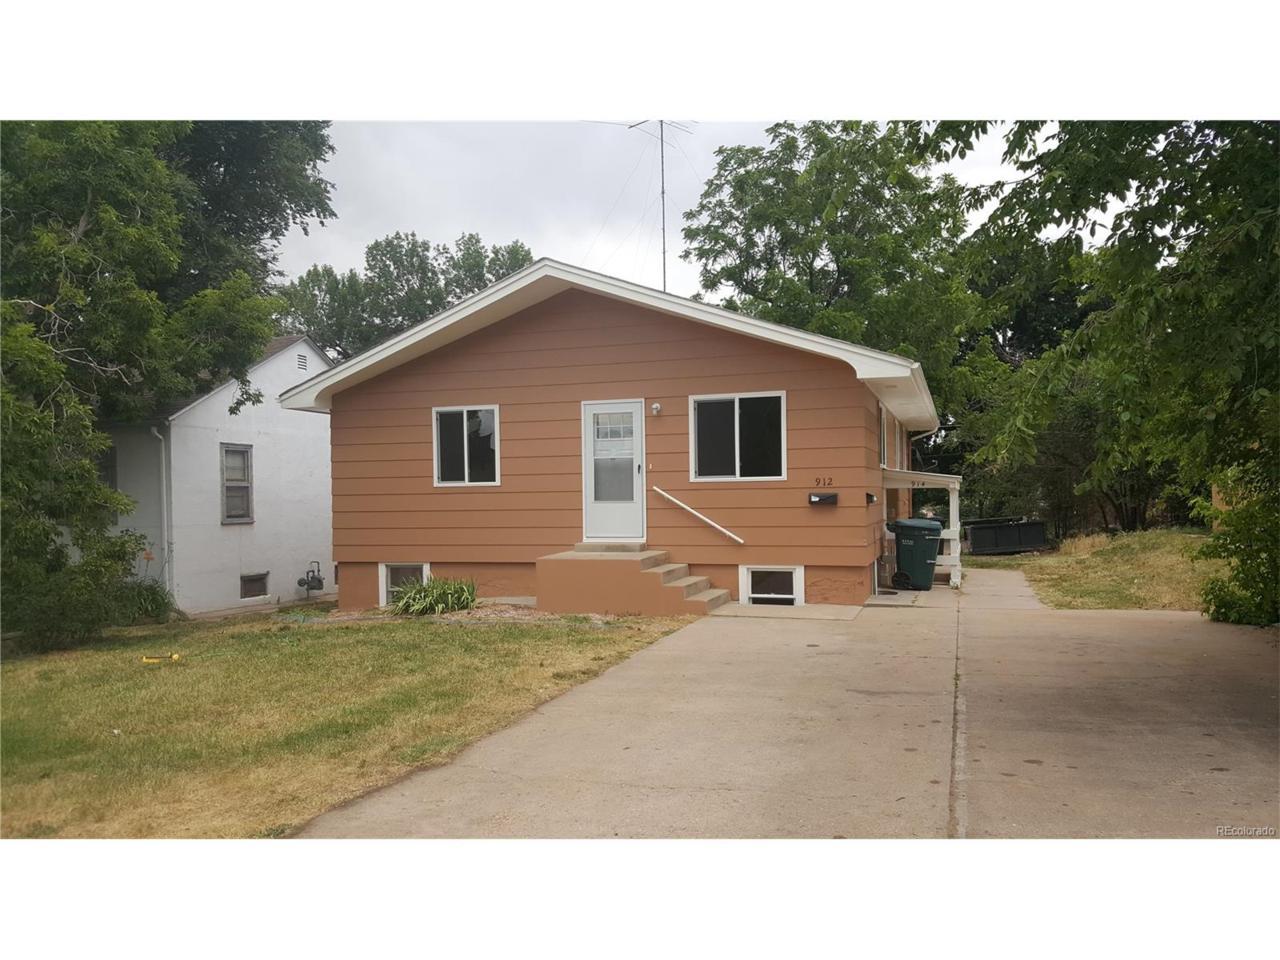 912 19th Avenue, Greeley, CO 80631 (MLS #6092722) :: 8z Real Estate